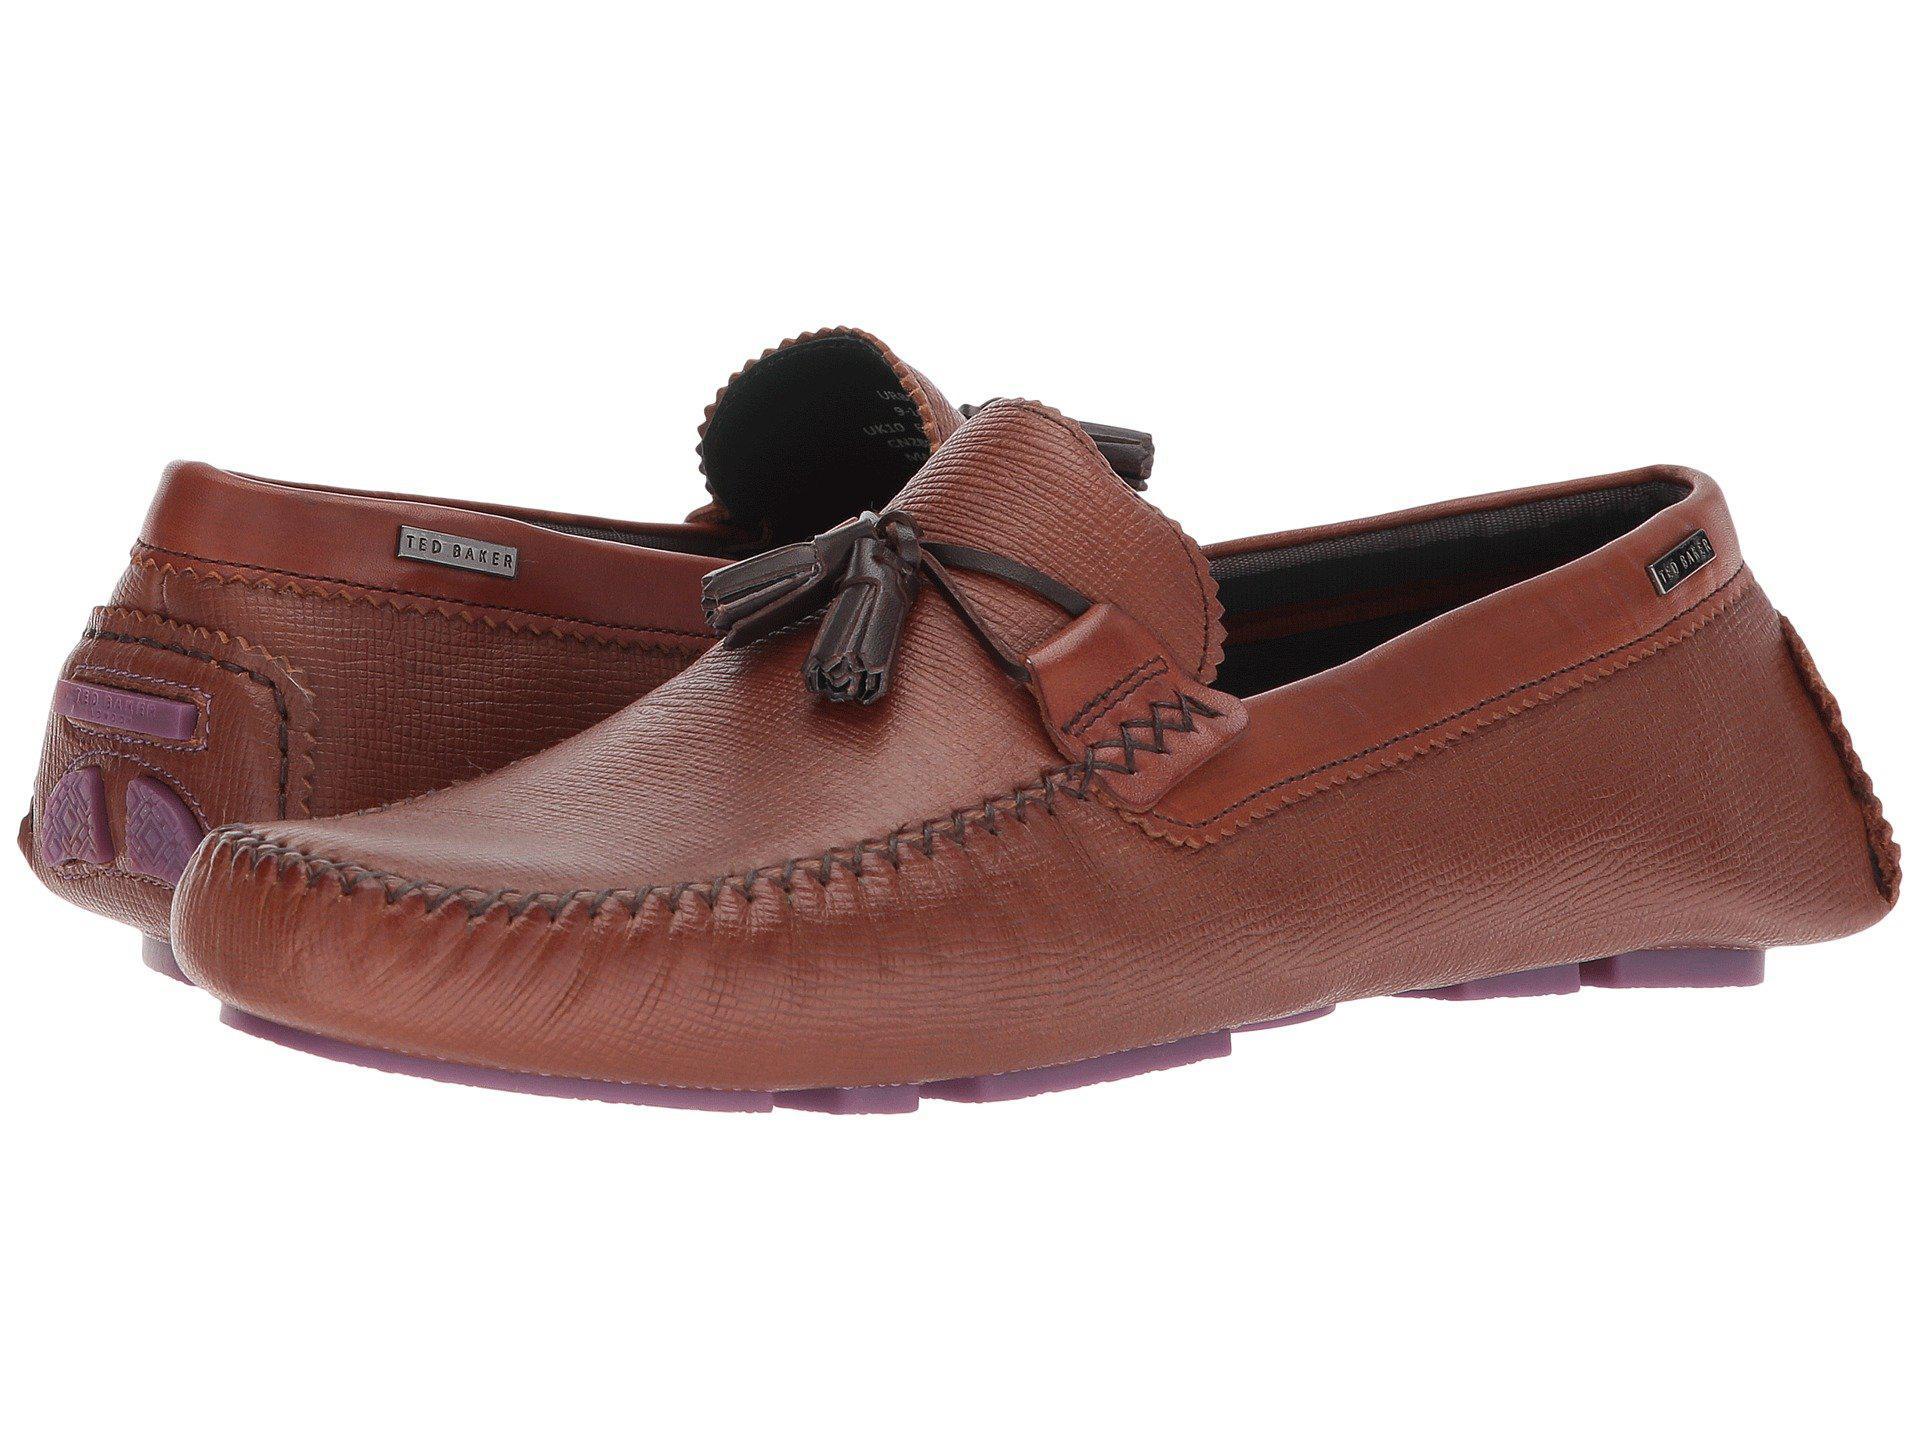 d7cd76046ad Lyst - Ted Baker Urbonn (dark Blue Leather) Men s Shoes in Brown for Men